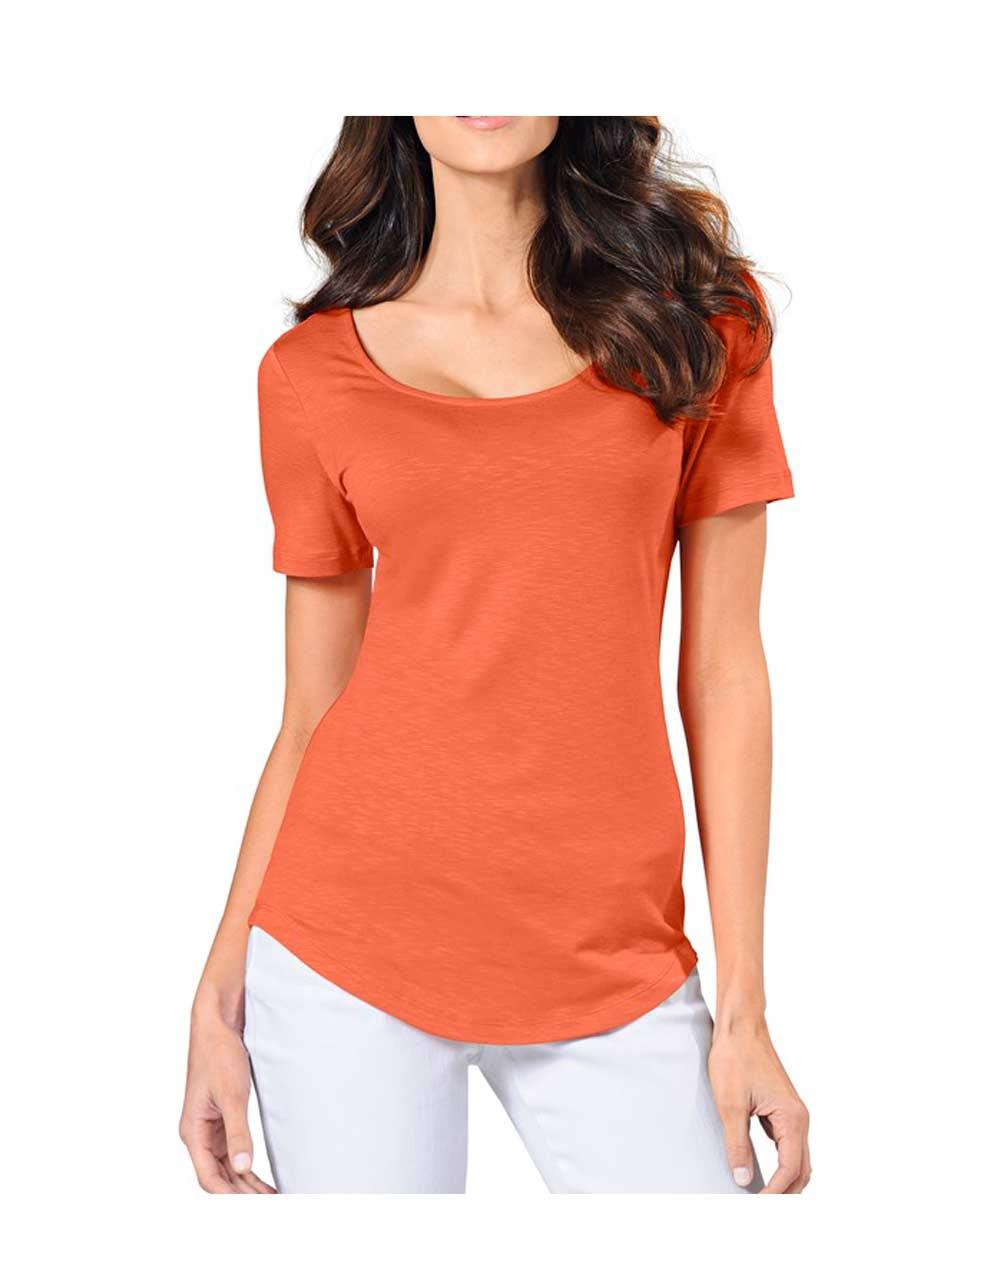 172.900 Rückendekolleté-Shirt, orange von Rick Cardona Grösse 38